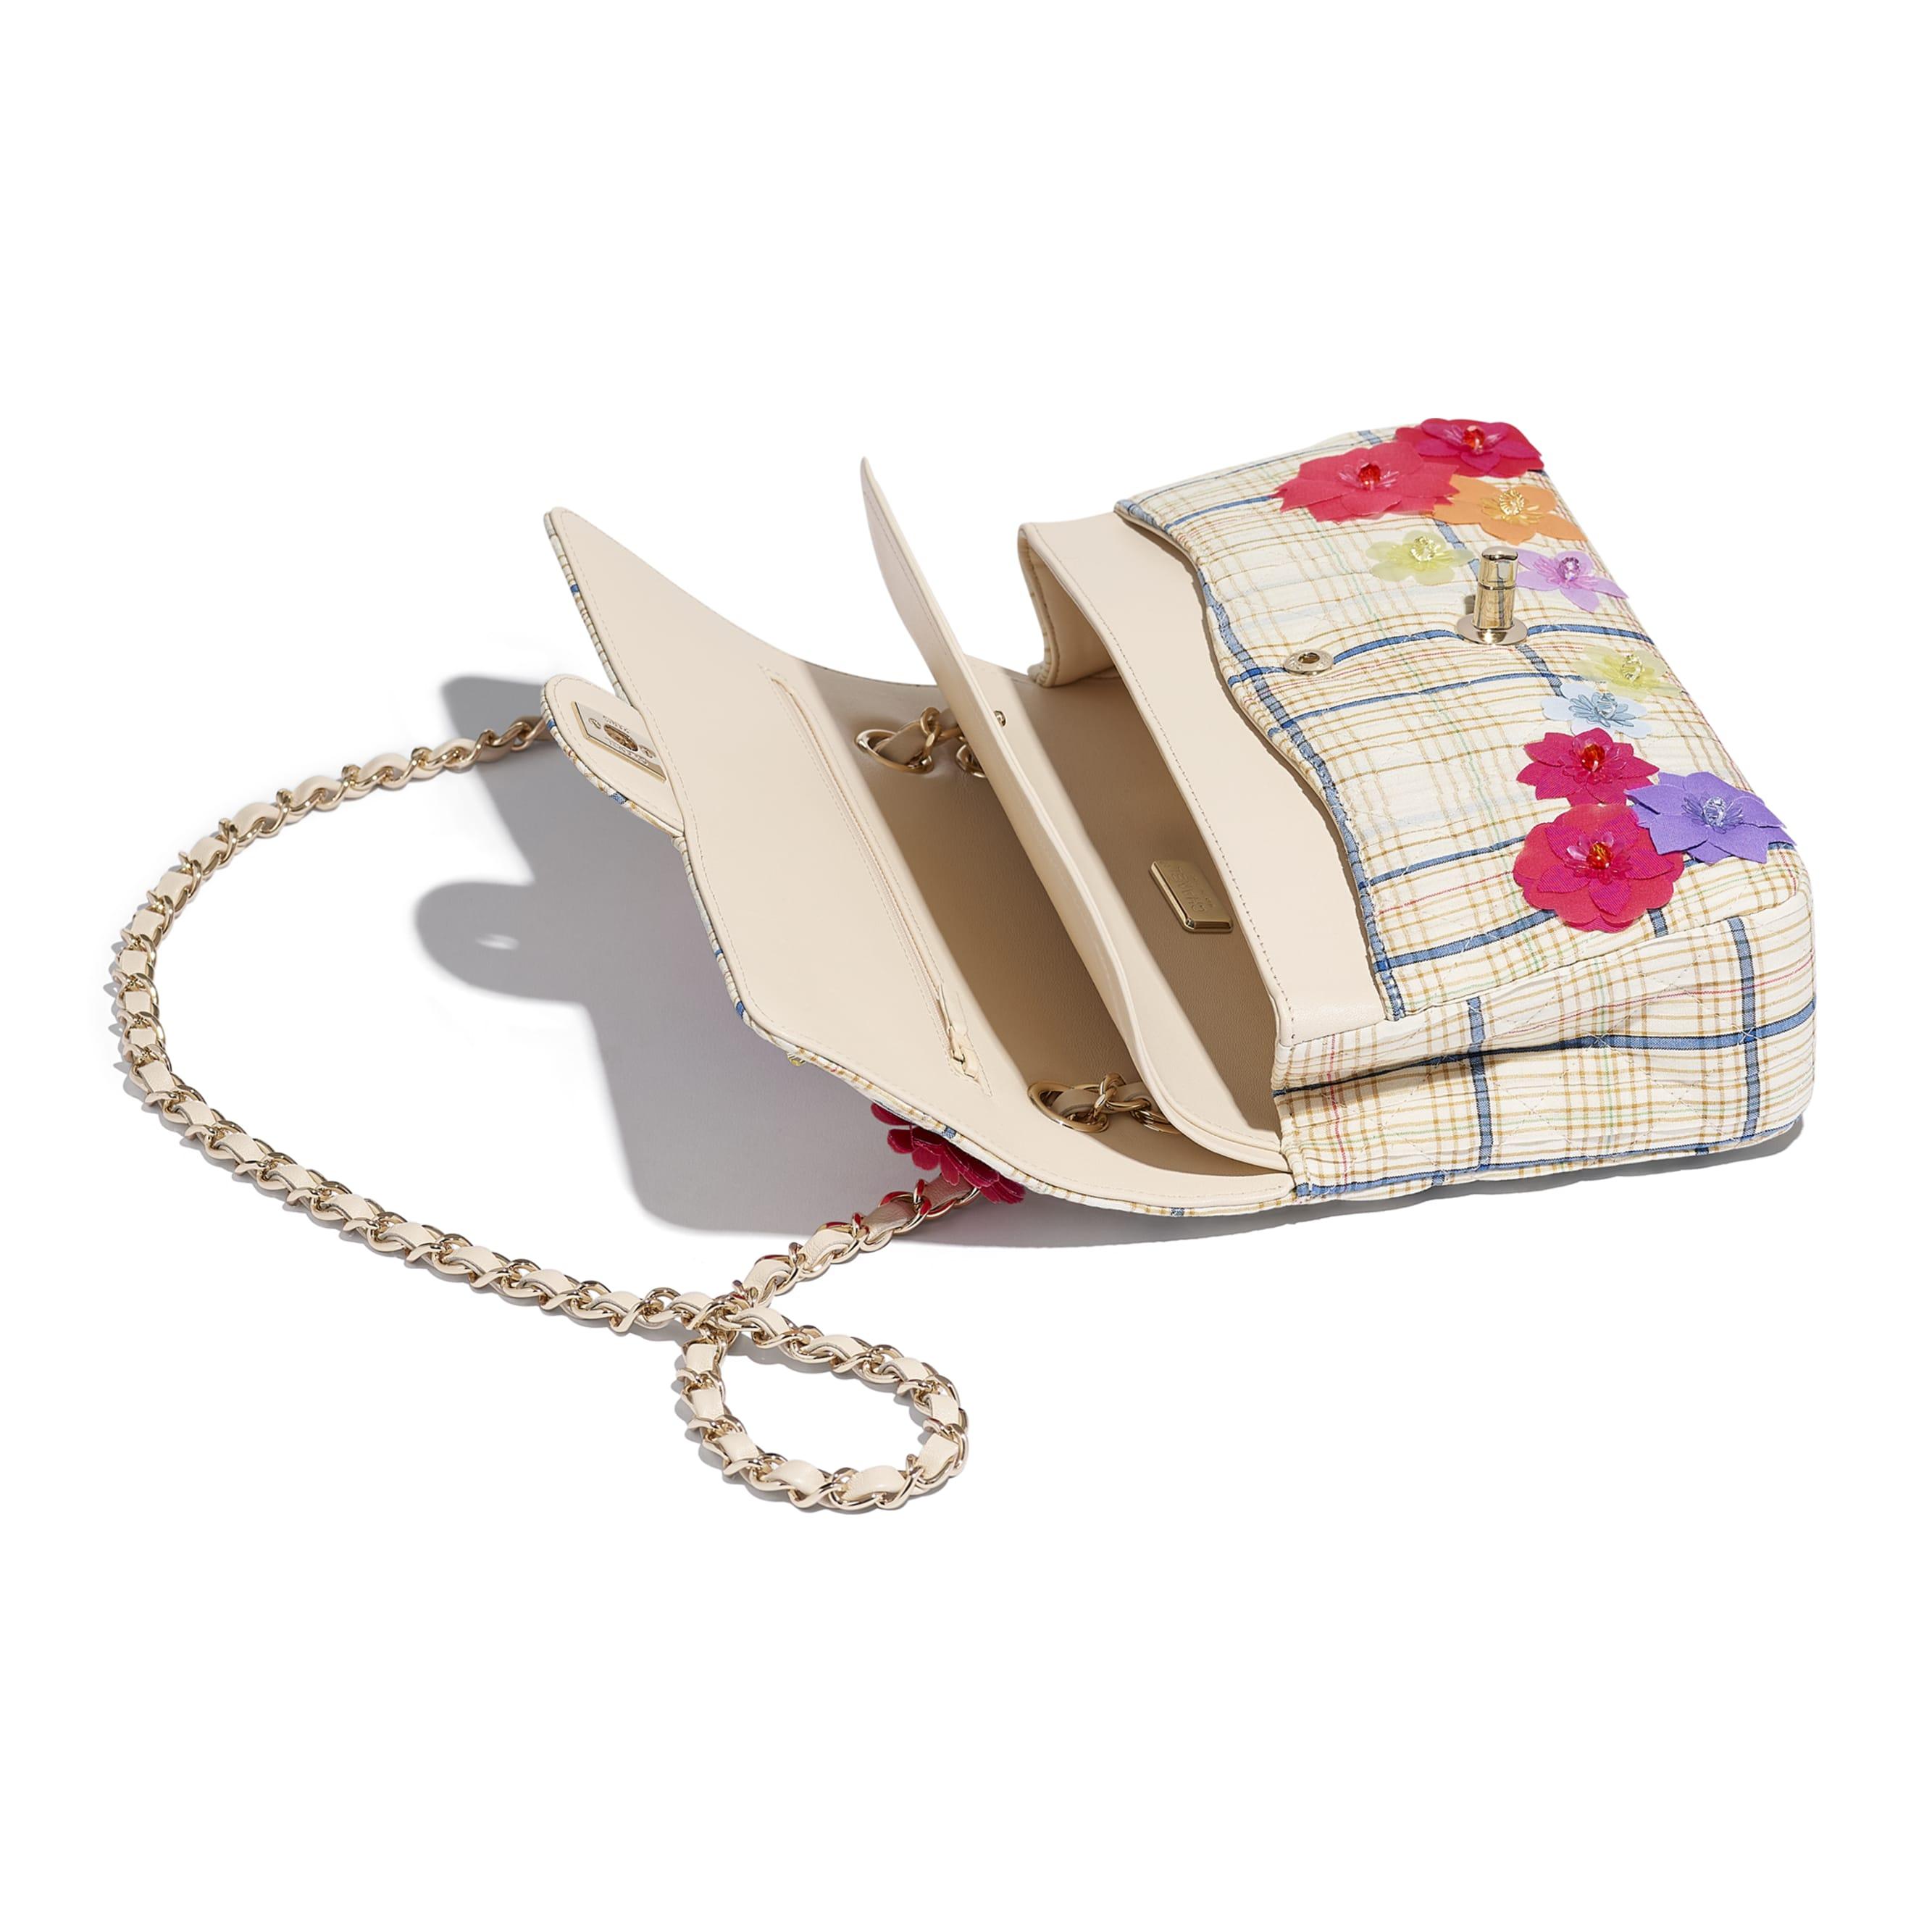 Classic Handbag - Ecru, Blue & Yellow - Cotton, Silk, Calfskin & Gold-Tone Metal - CHANEL - Other view - see standard sized version